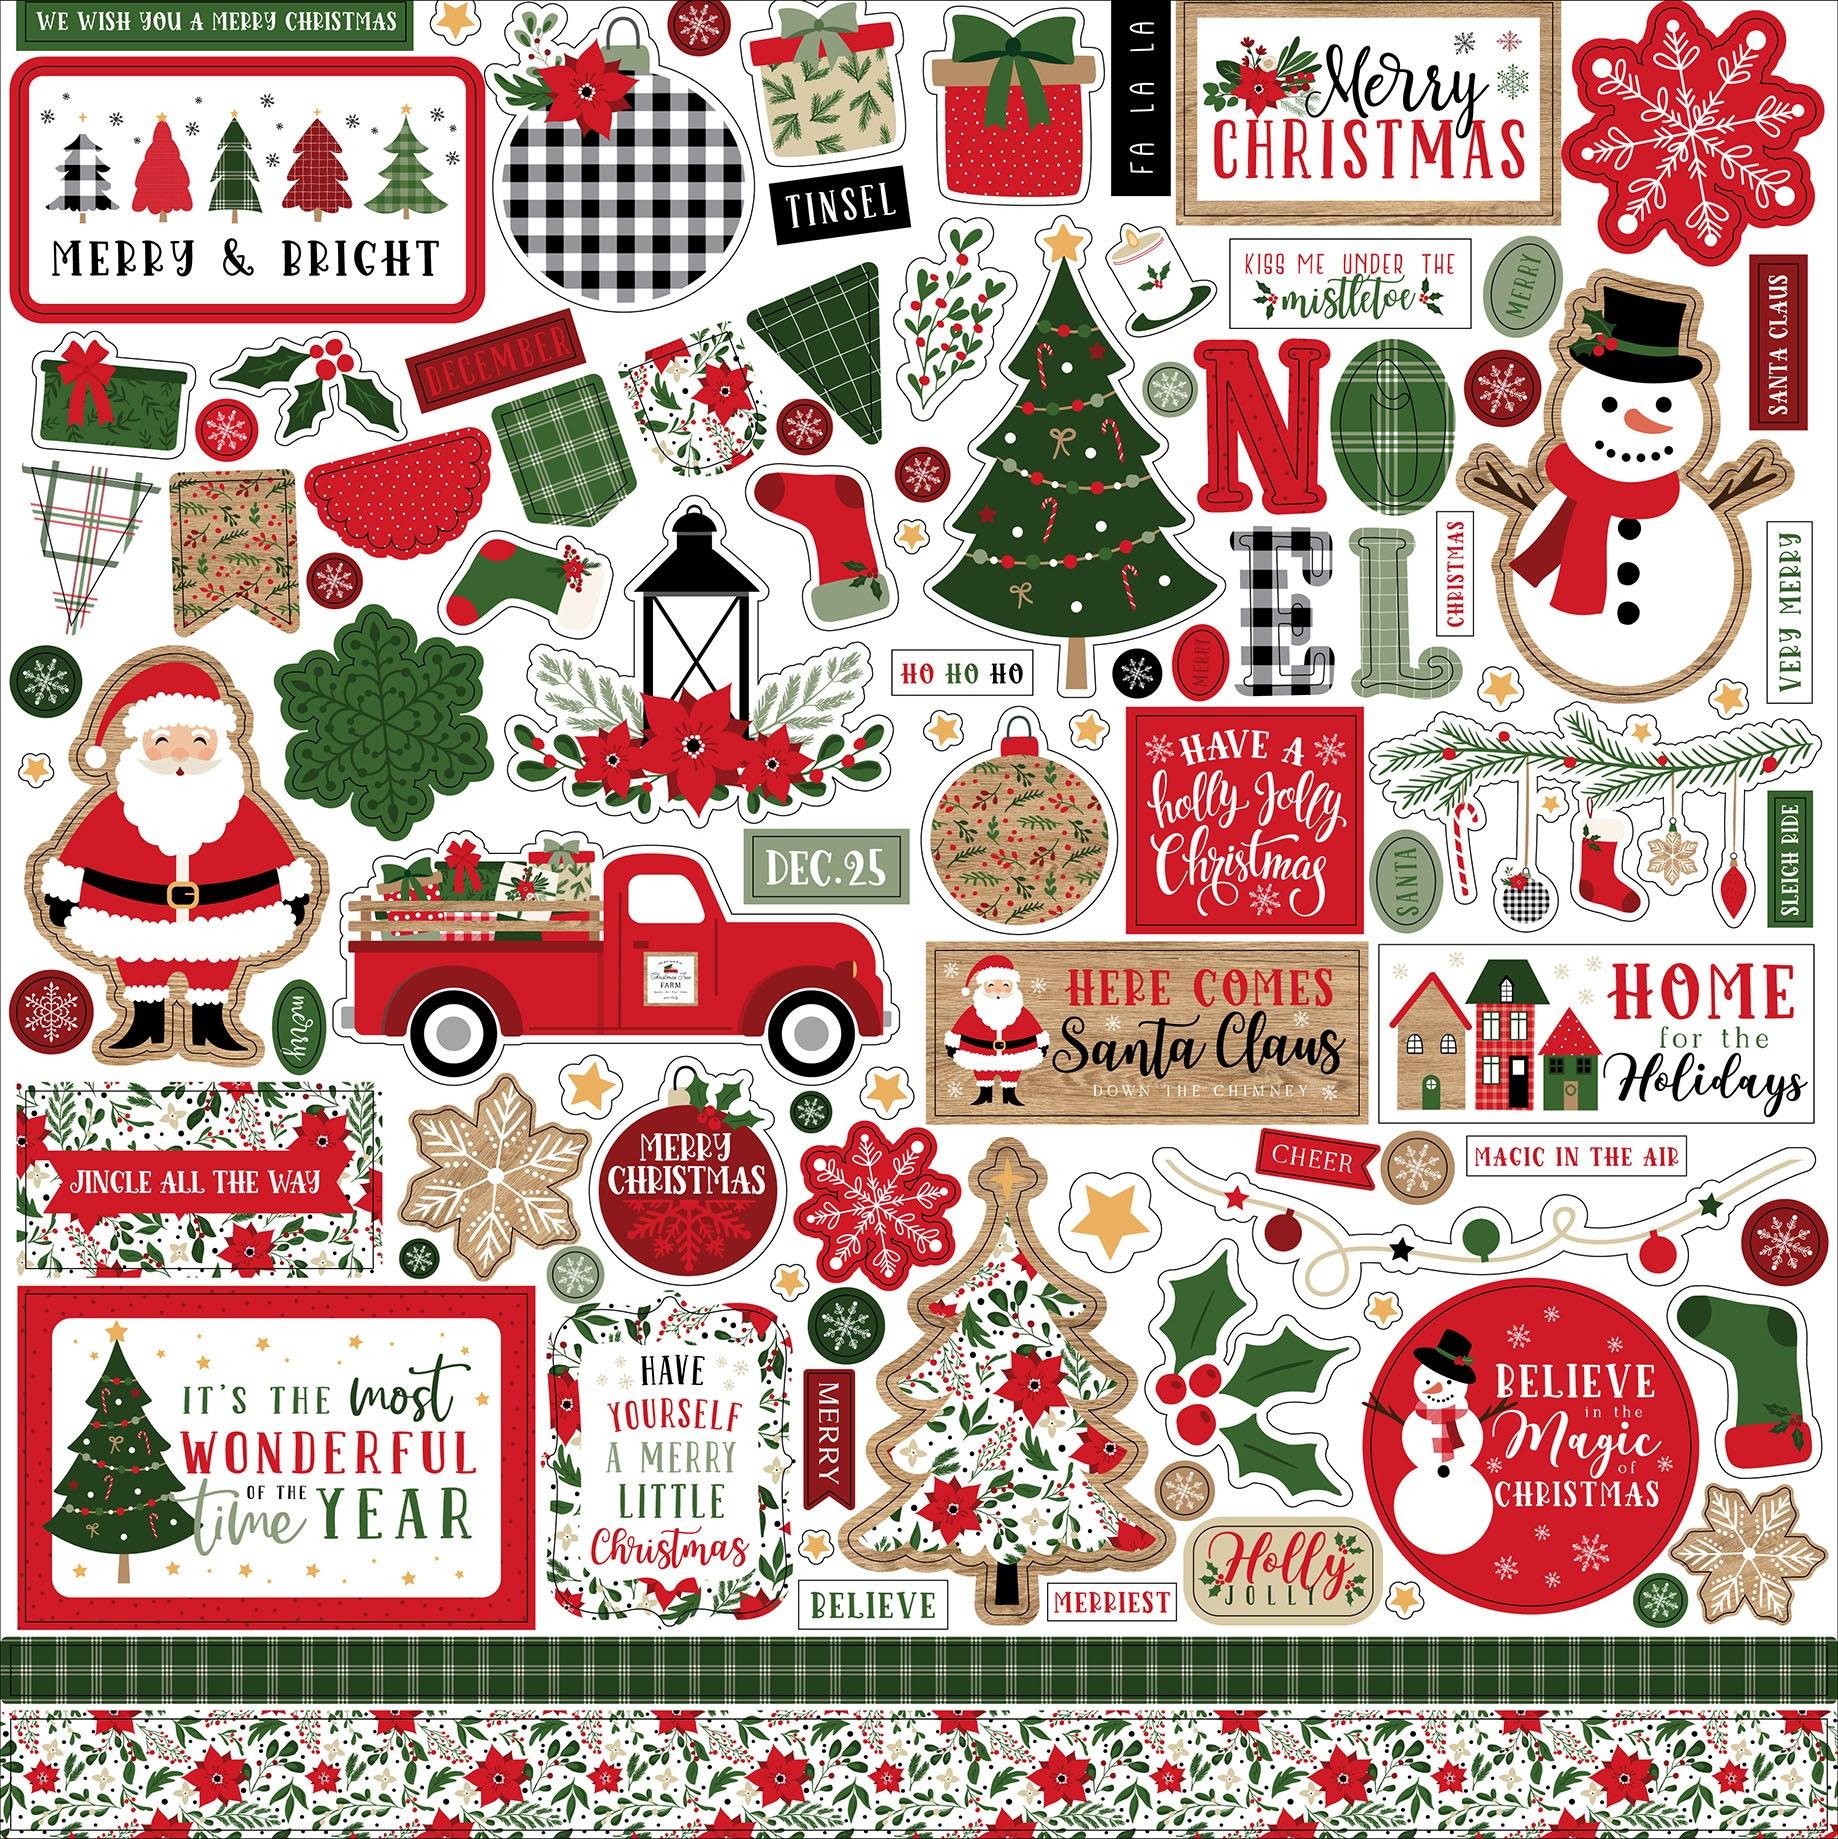 Echo Park - Jingle All The Way - 12x12 Element Sticker Sheet